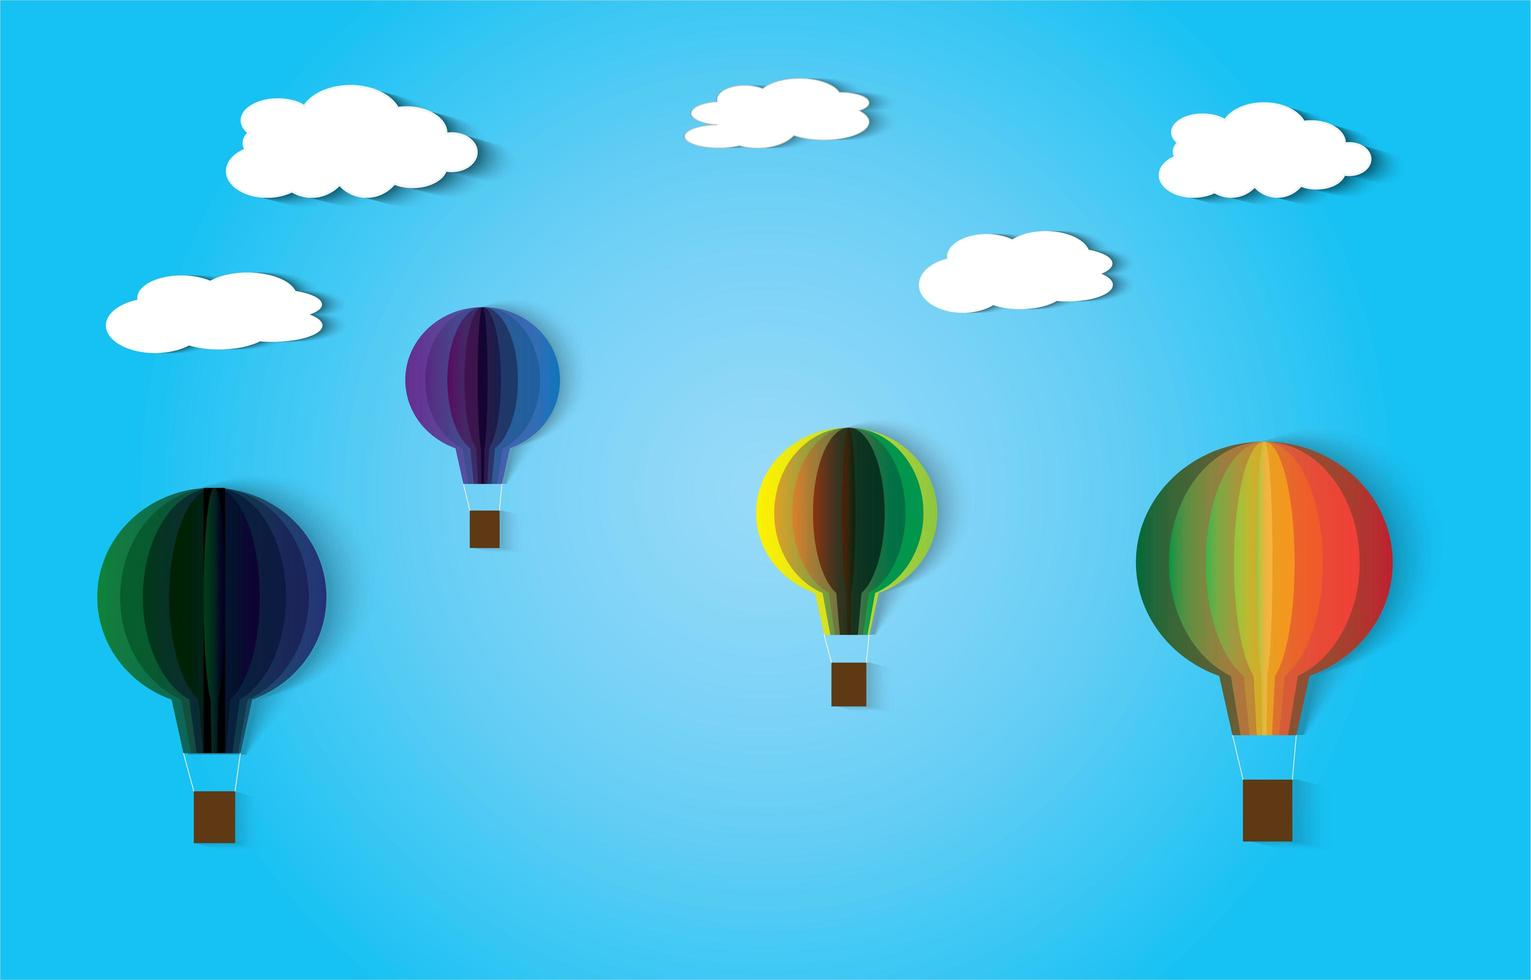 moln och luftballonger papper konst stil design vektor